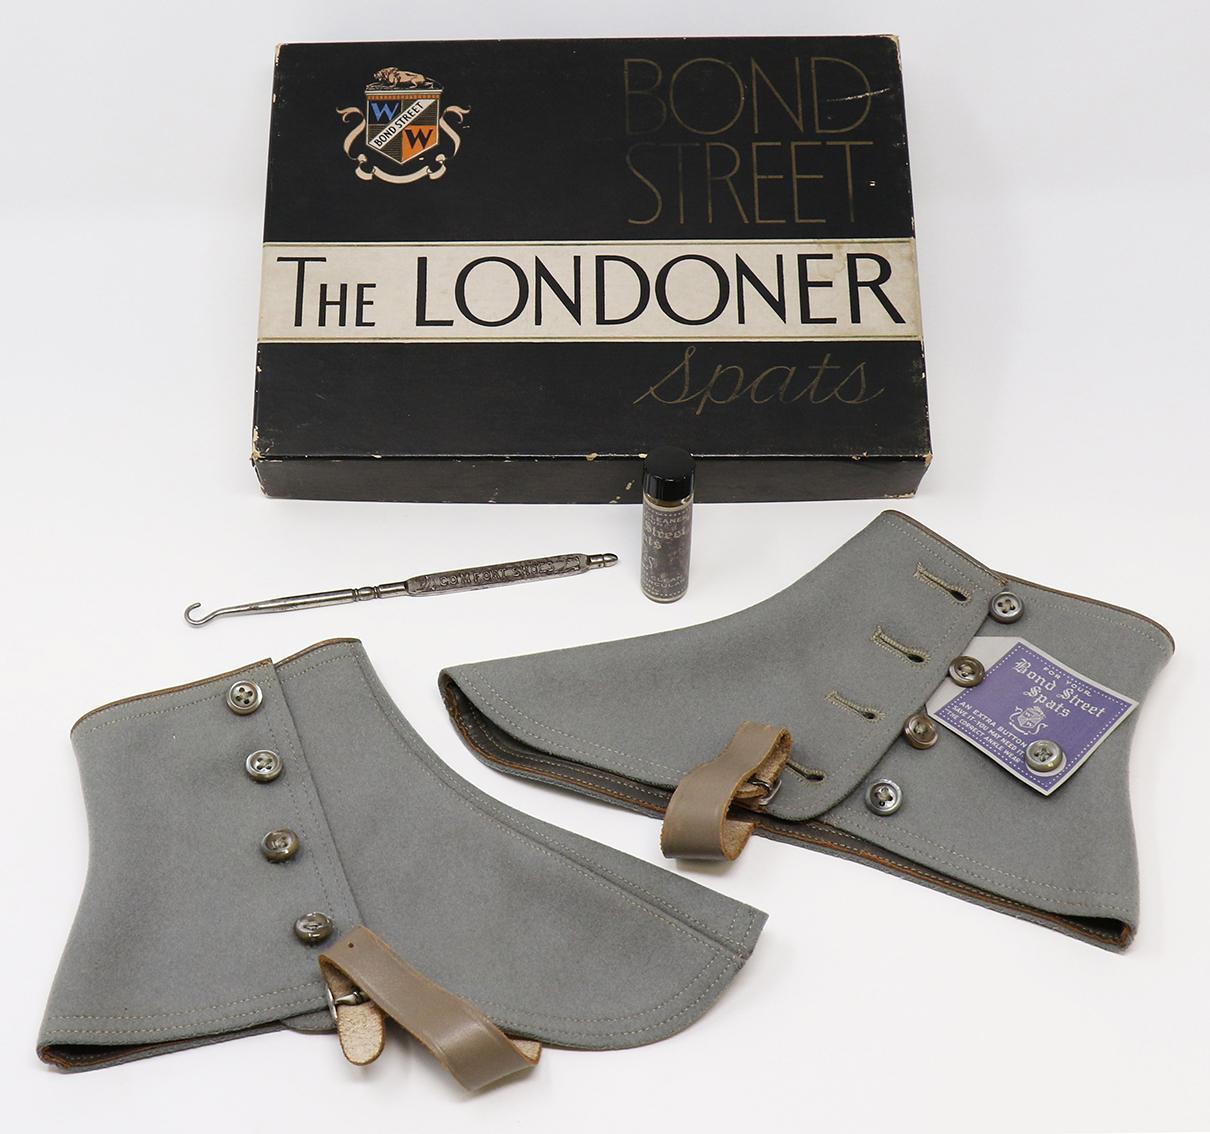 A Custom Box for Bond Street Spats